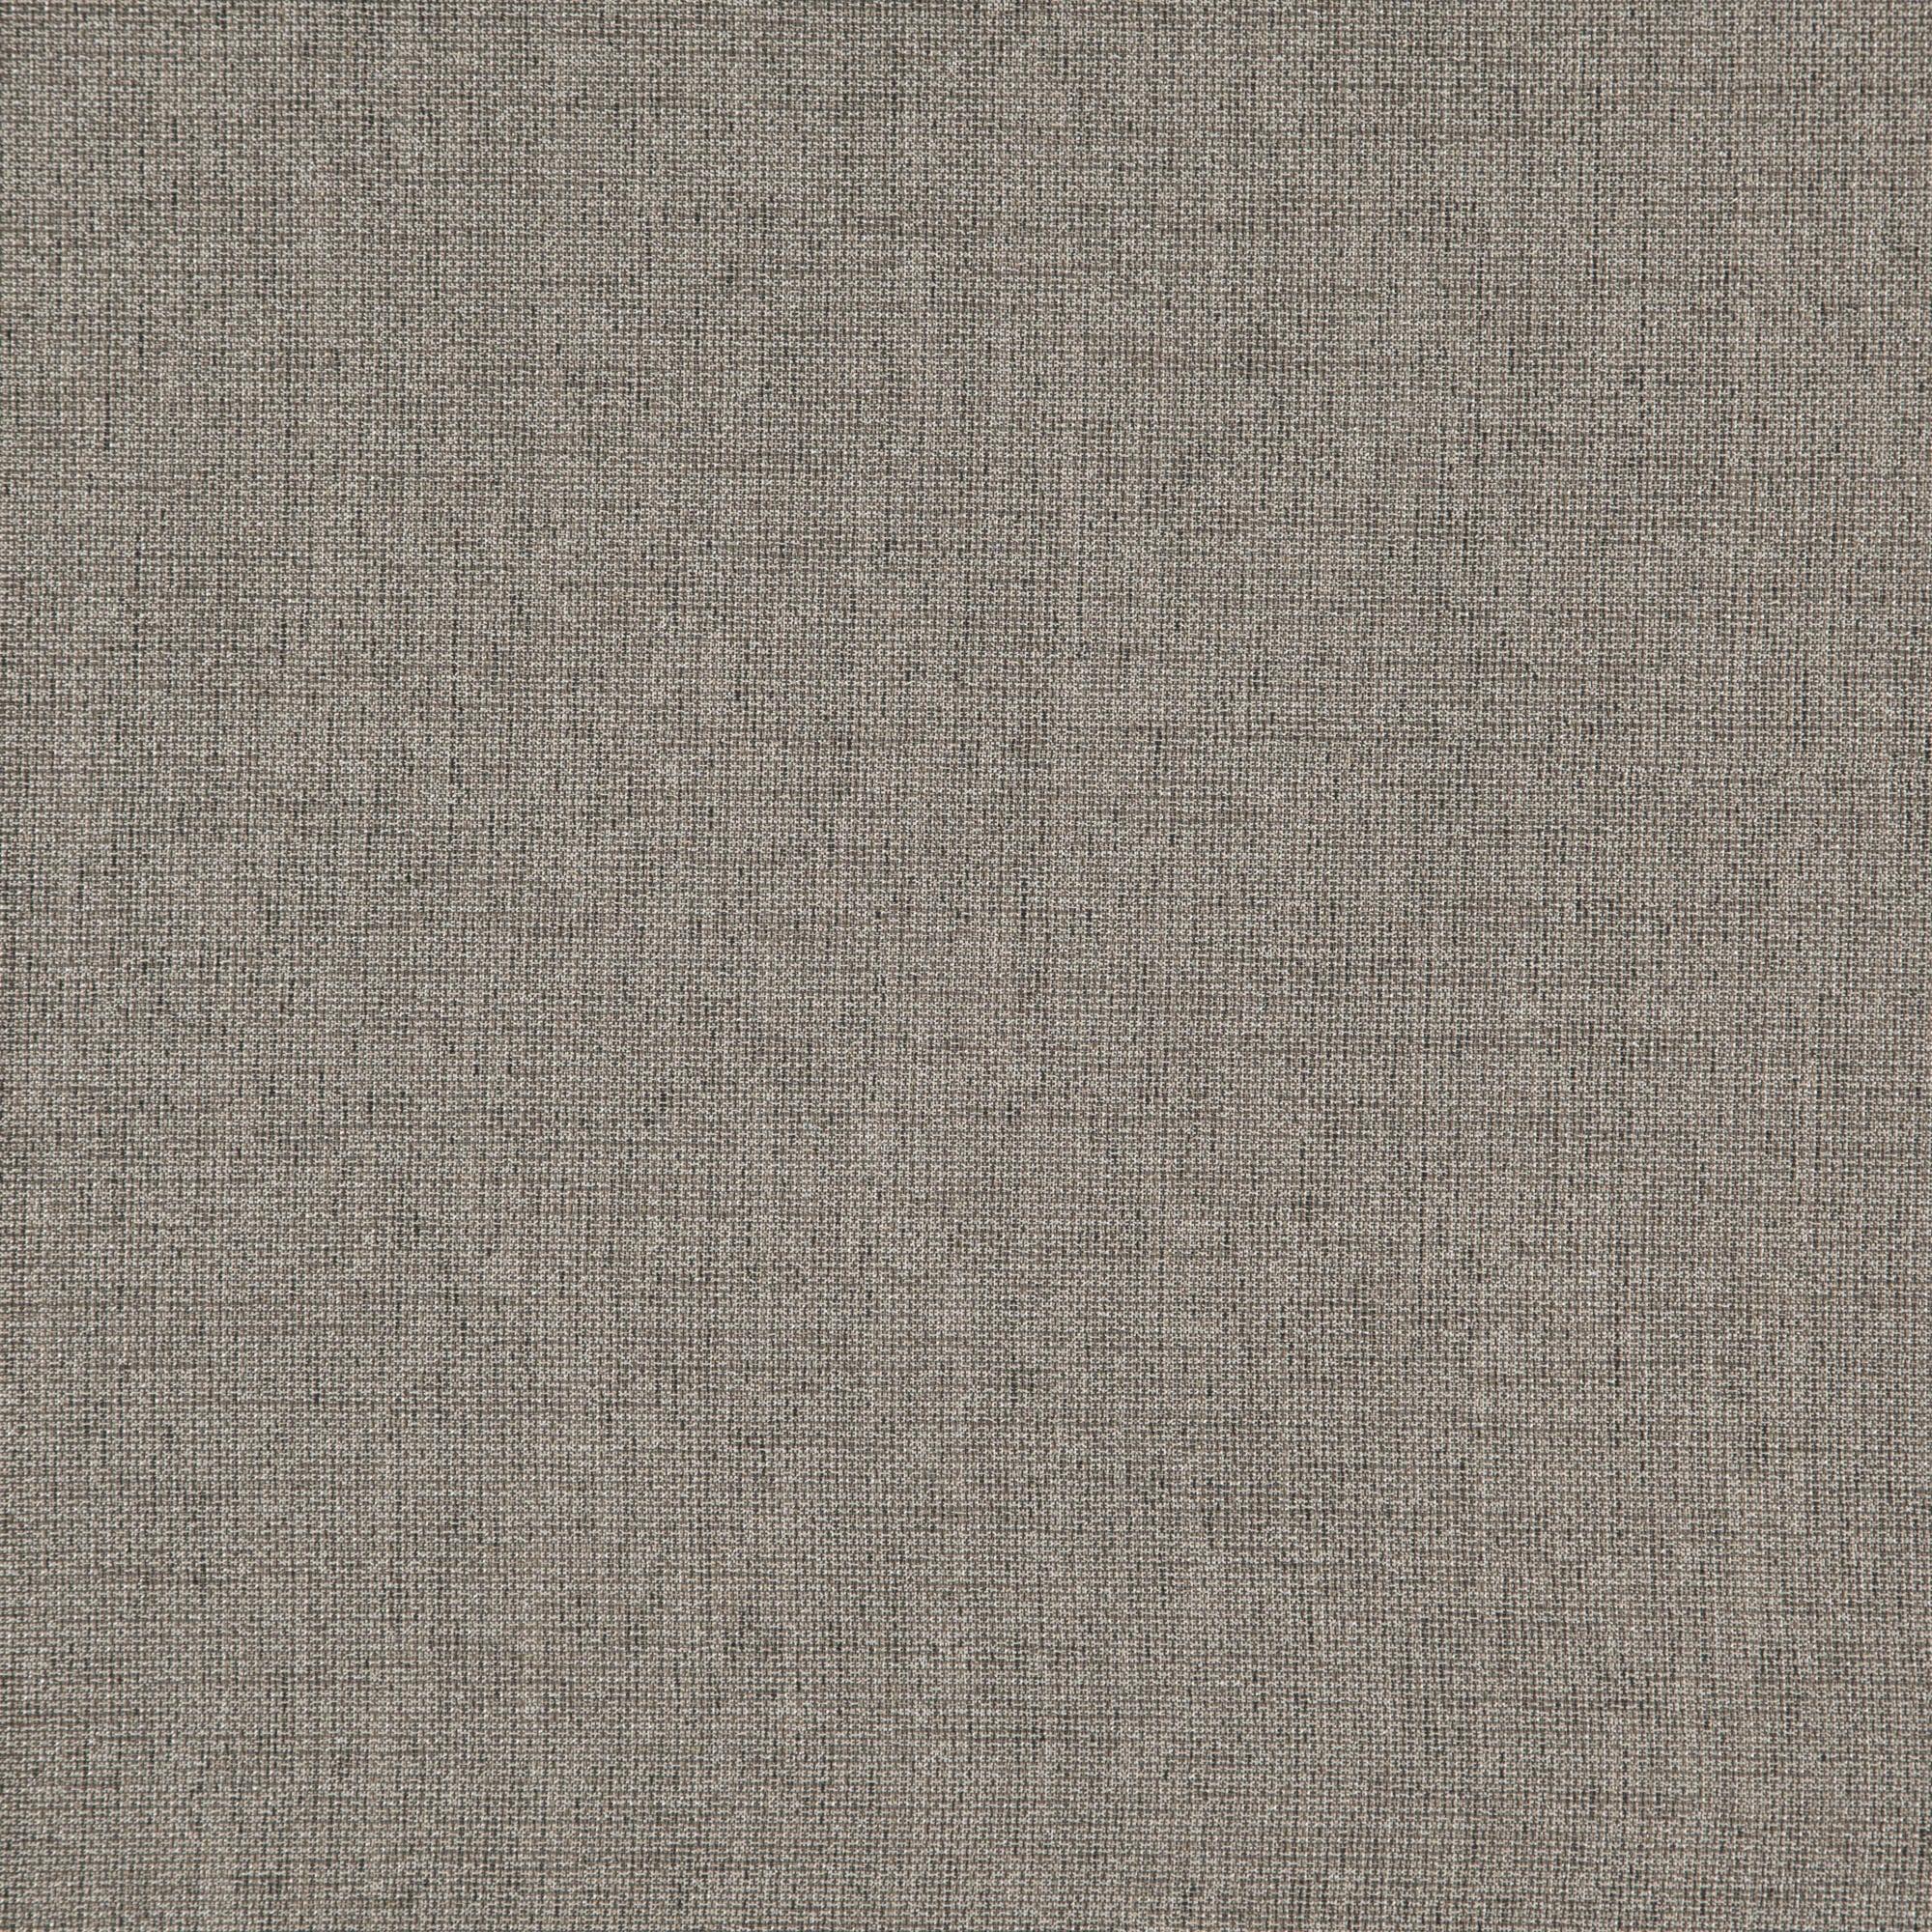 Zephyr-02-Sepia - Sekers Fabrics